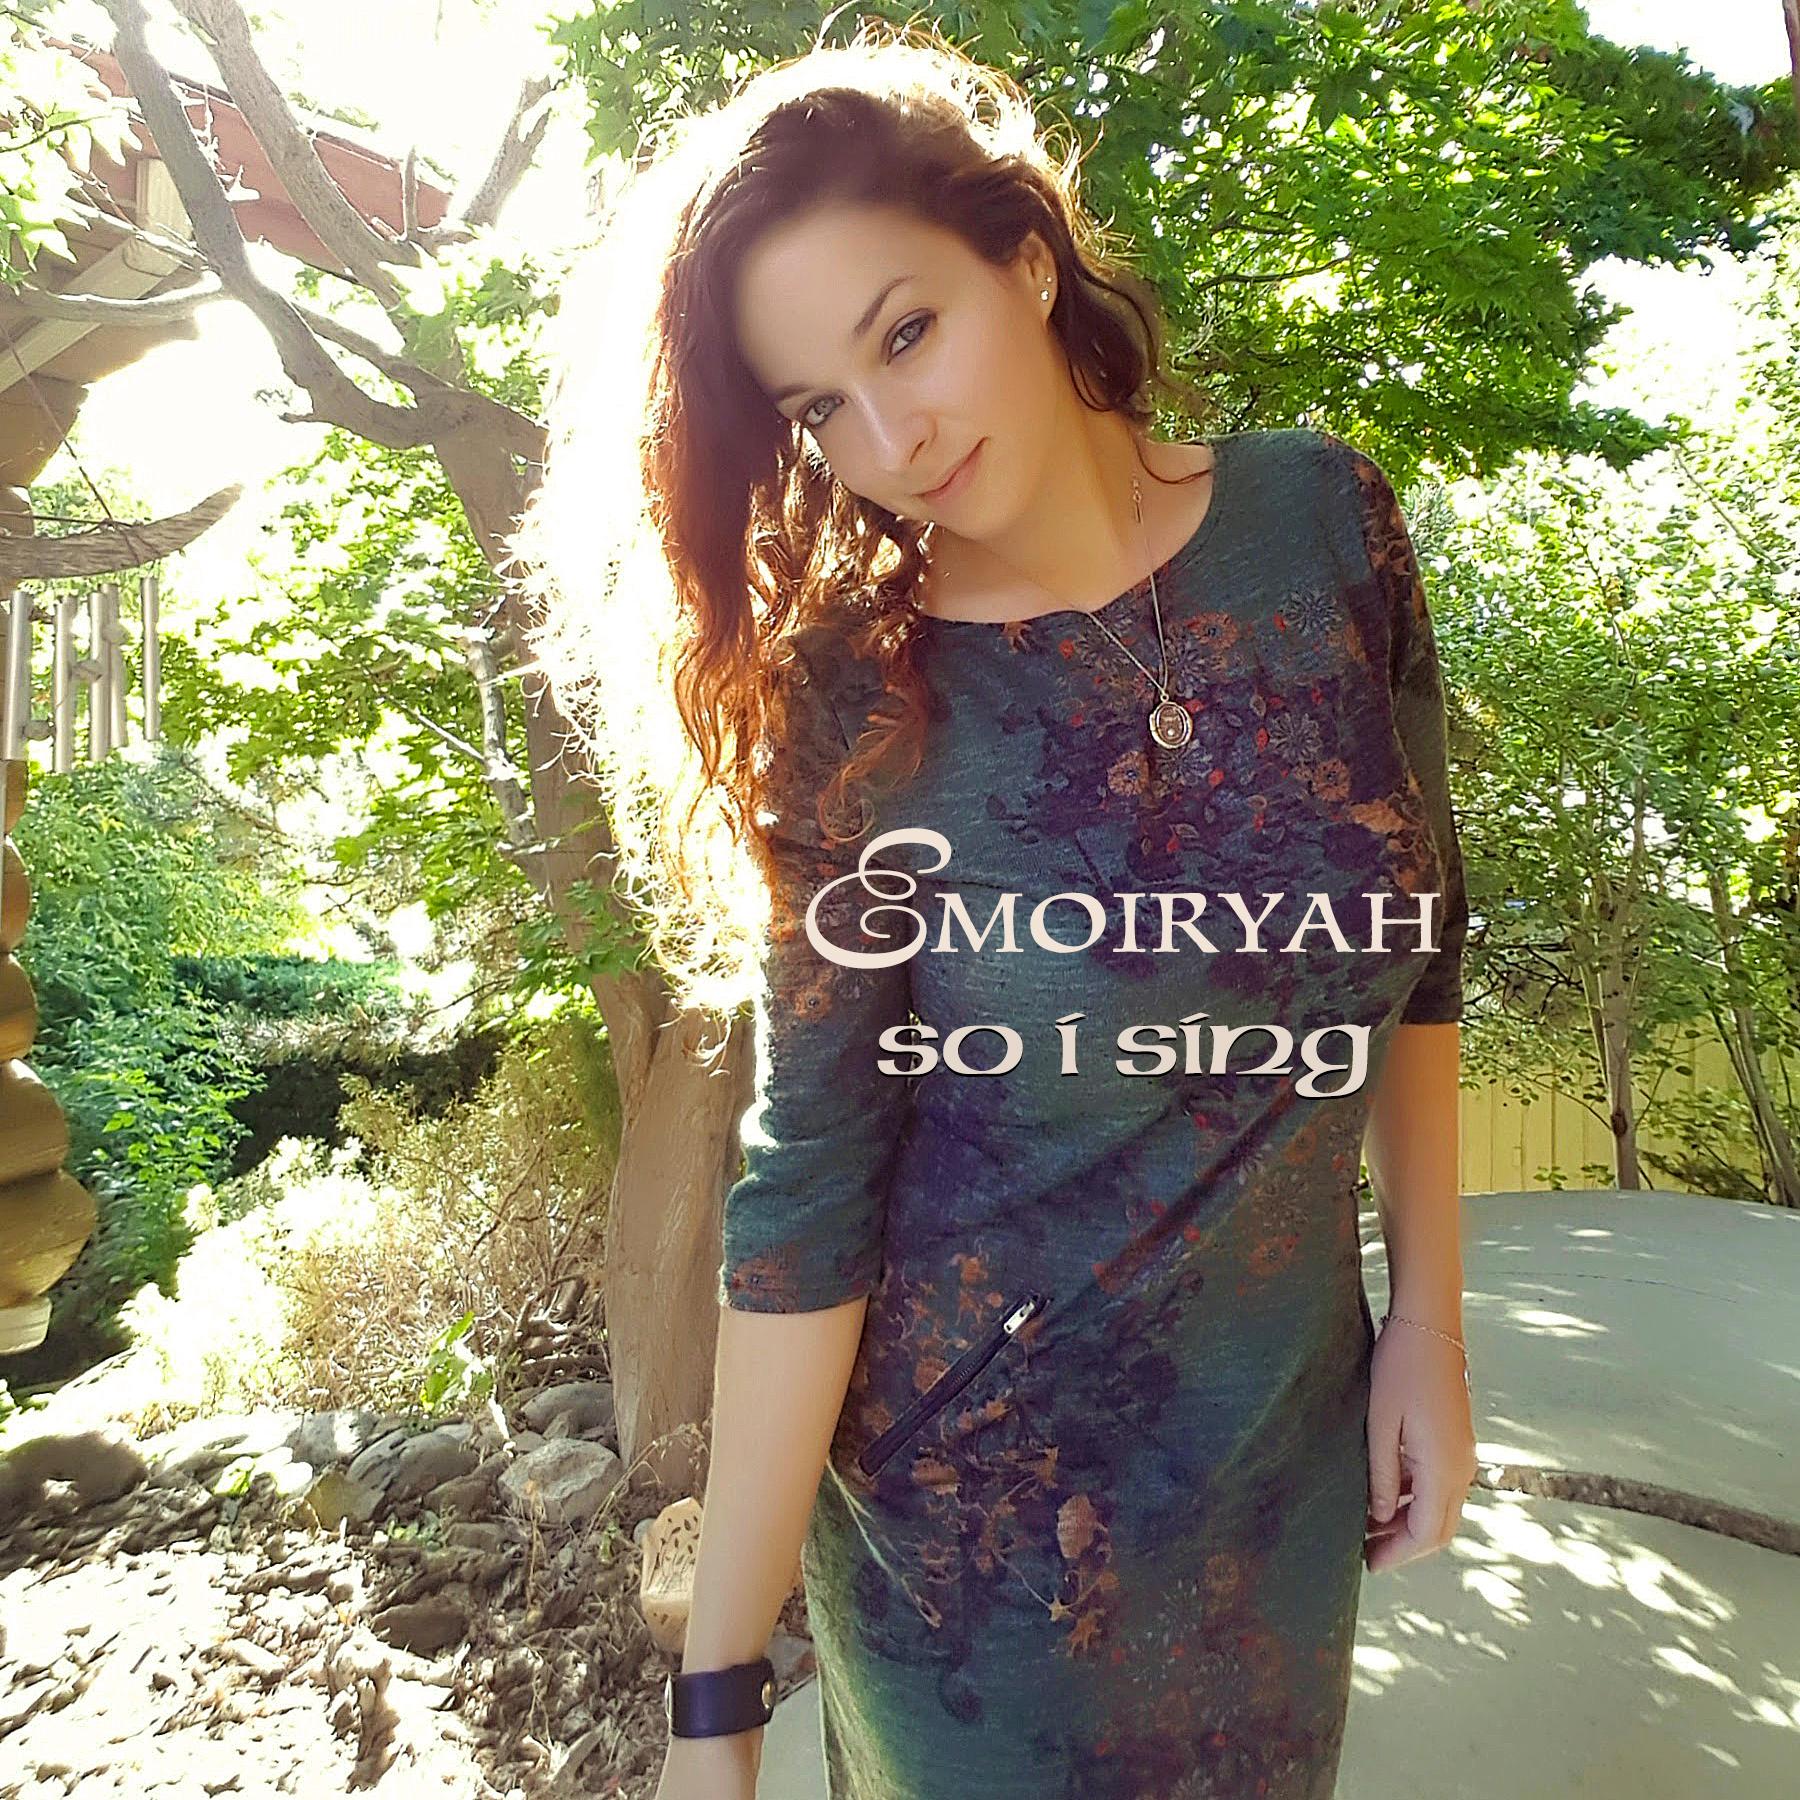 EMOIRYAH